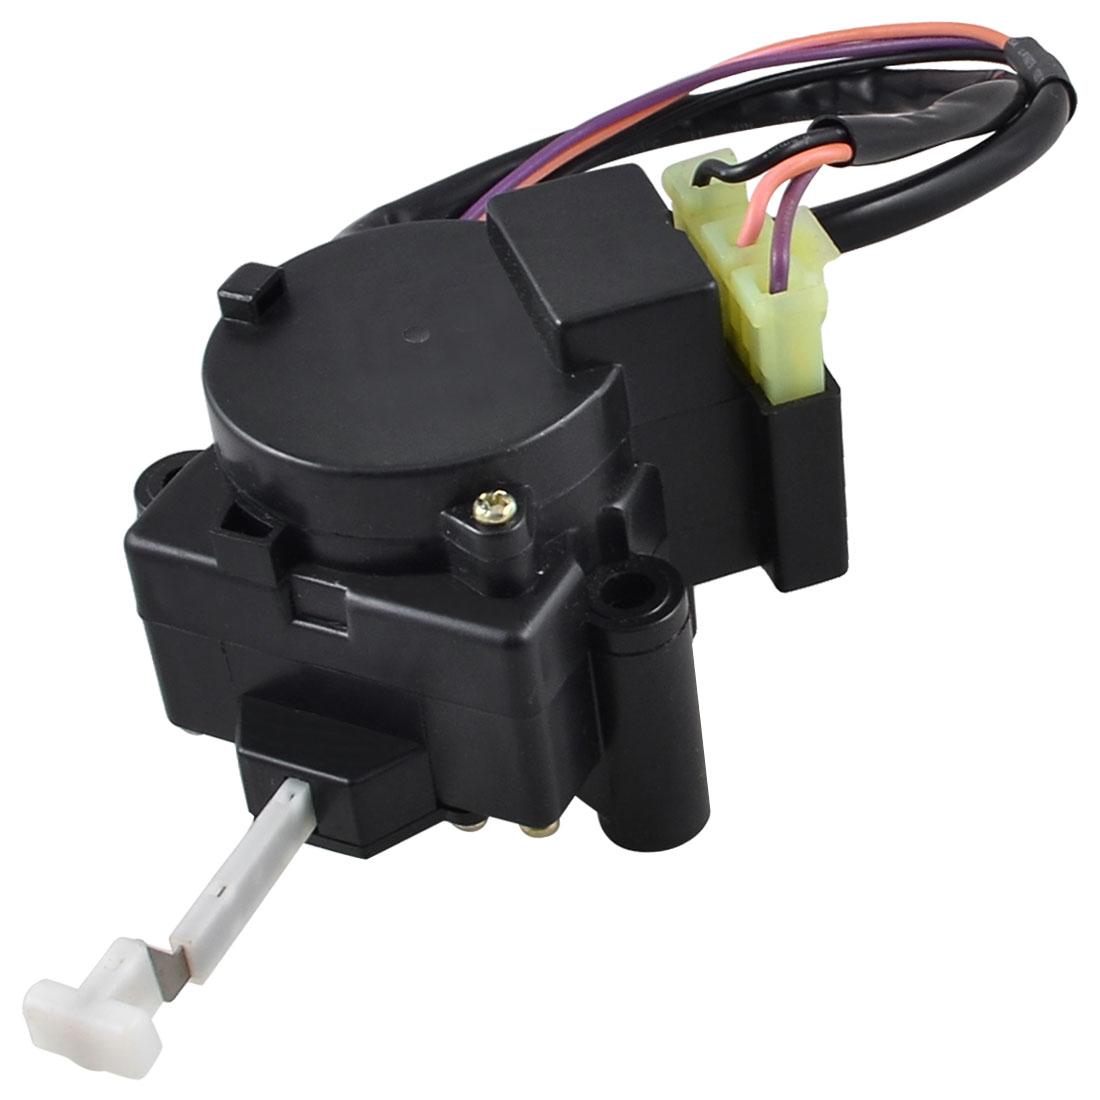 XQD22-5 AC 220/240V 50/60Hz Drain Valve Tractor for Panasonic Washing Machine